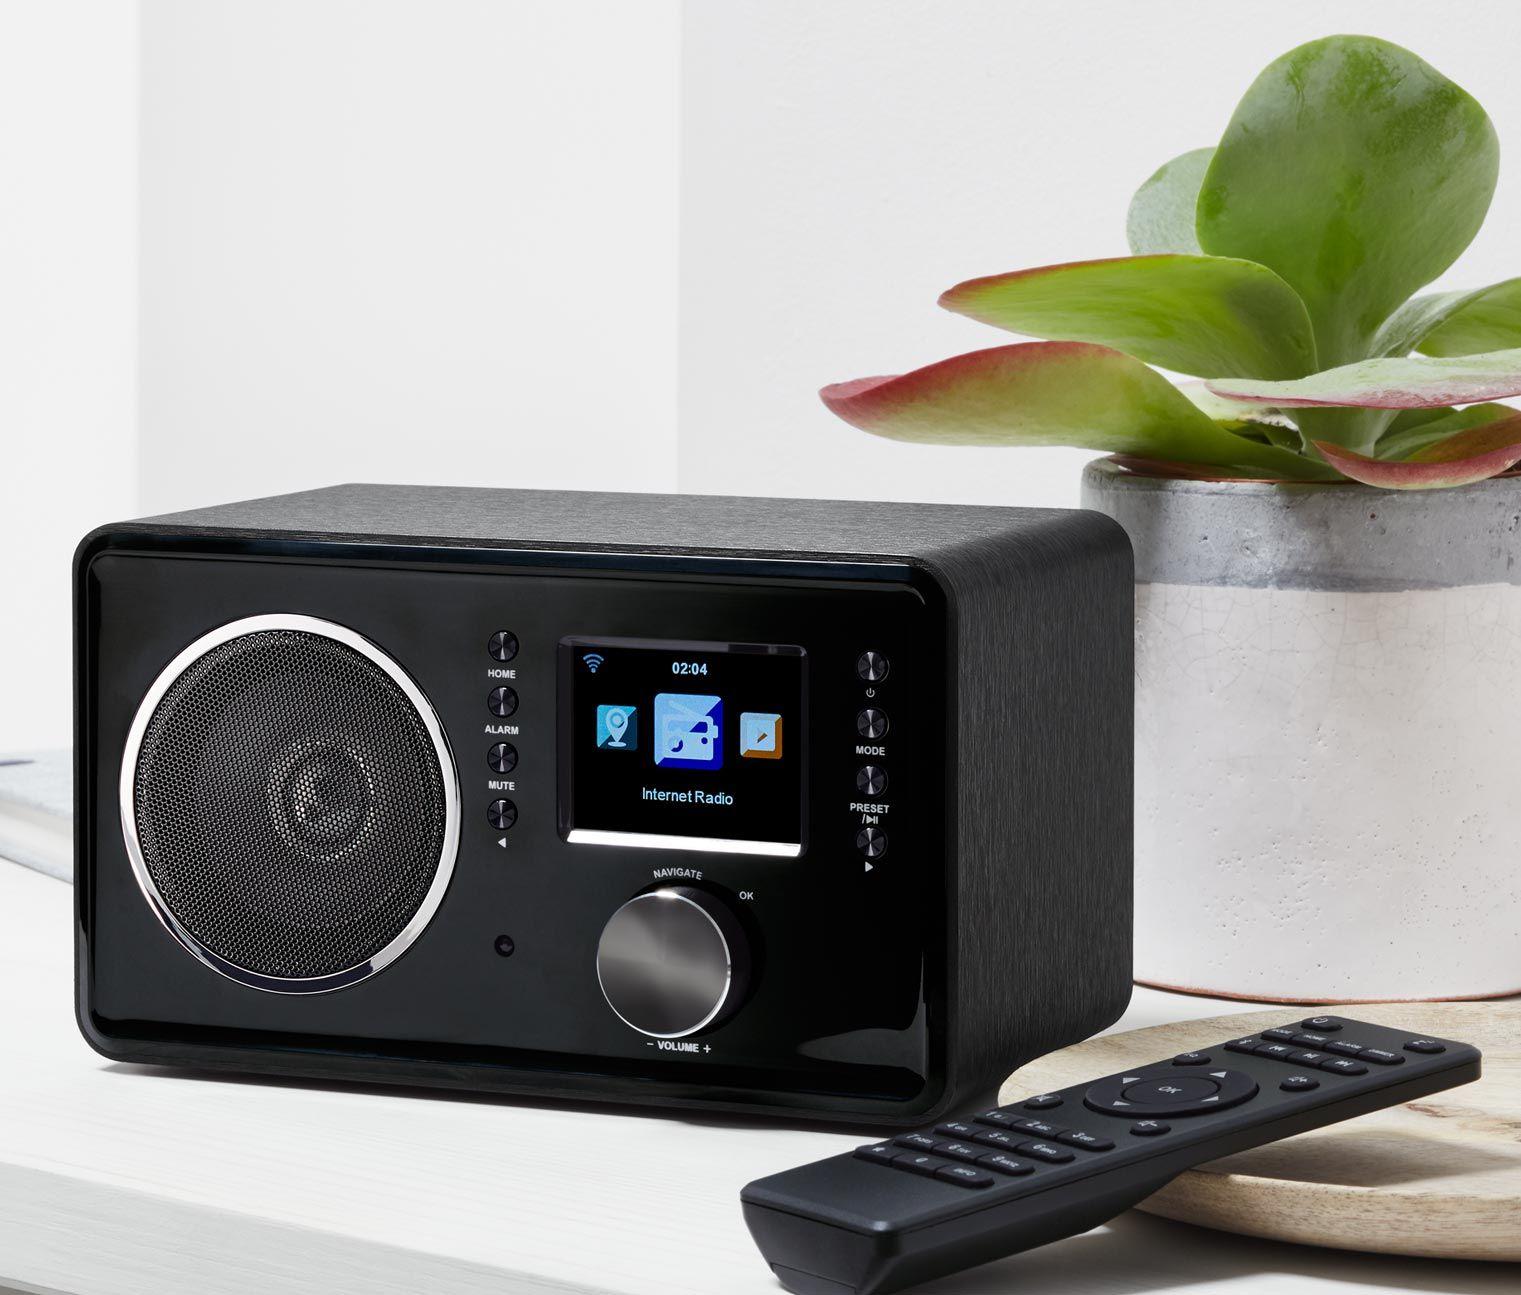 WLAN-Internetradio | Tchibo | Internet radio, Wlan und Bluetooth